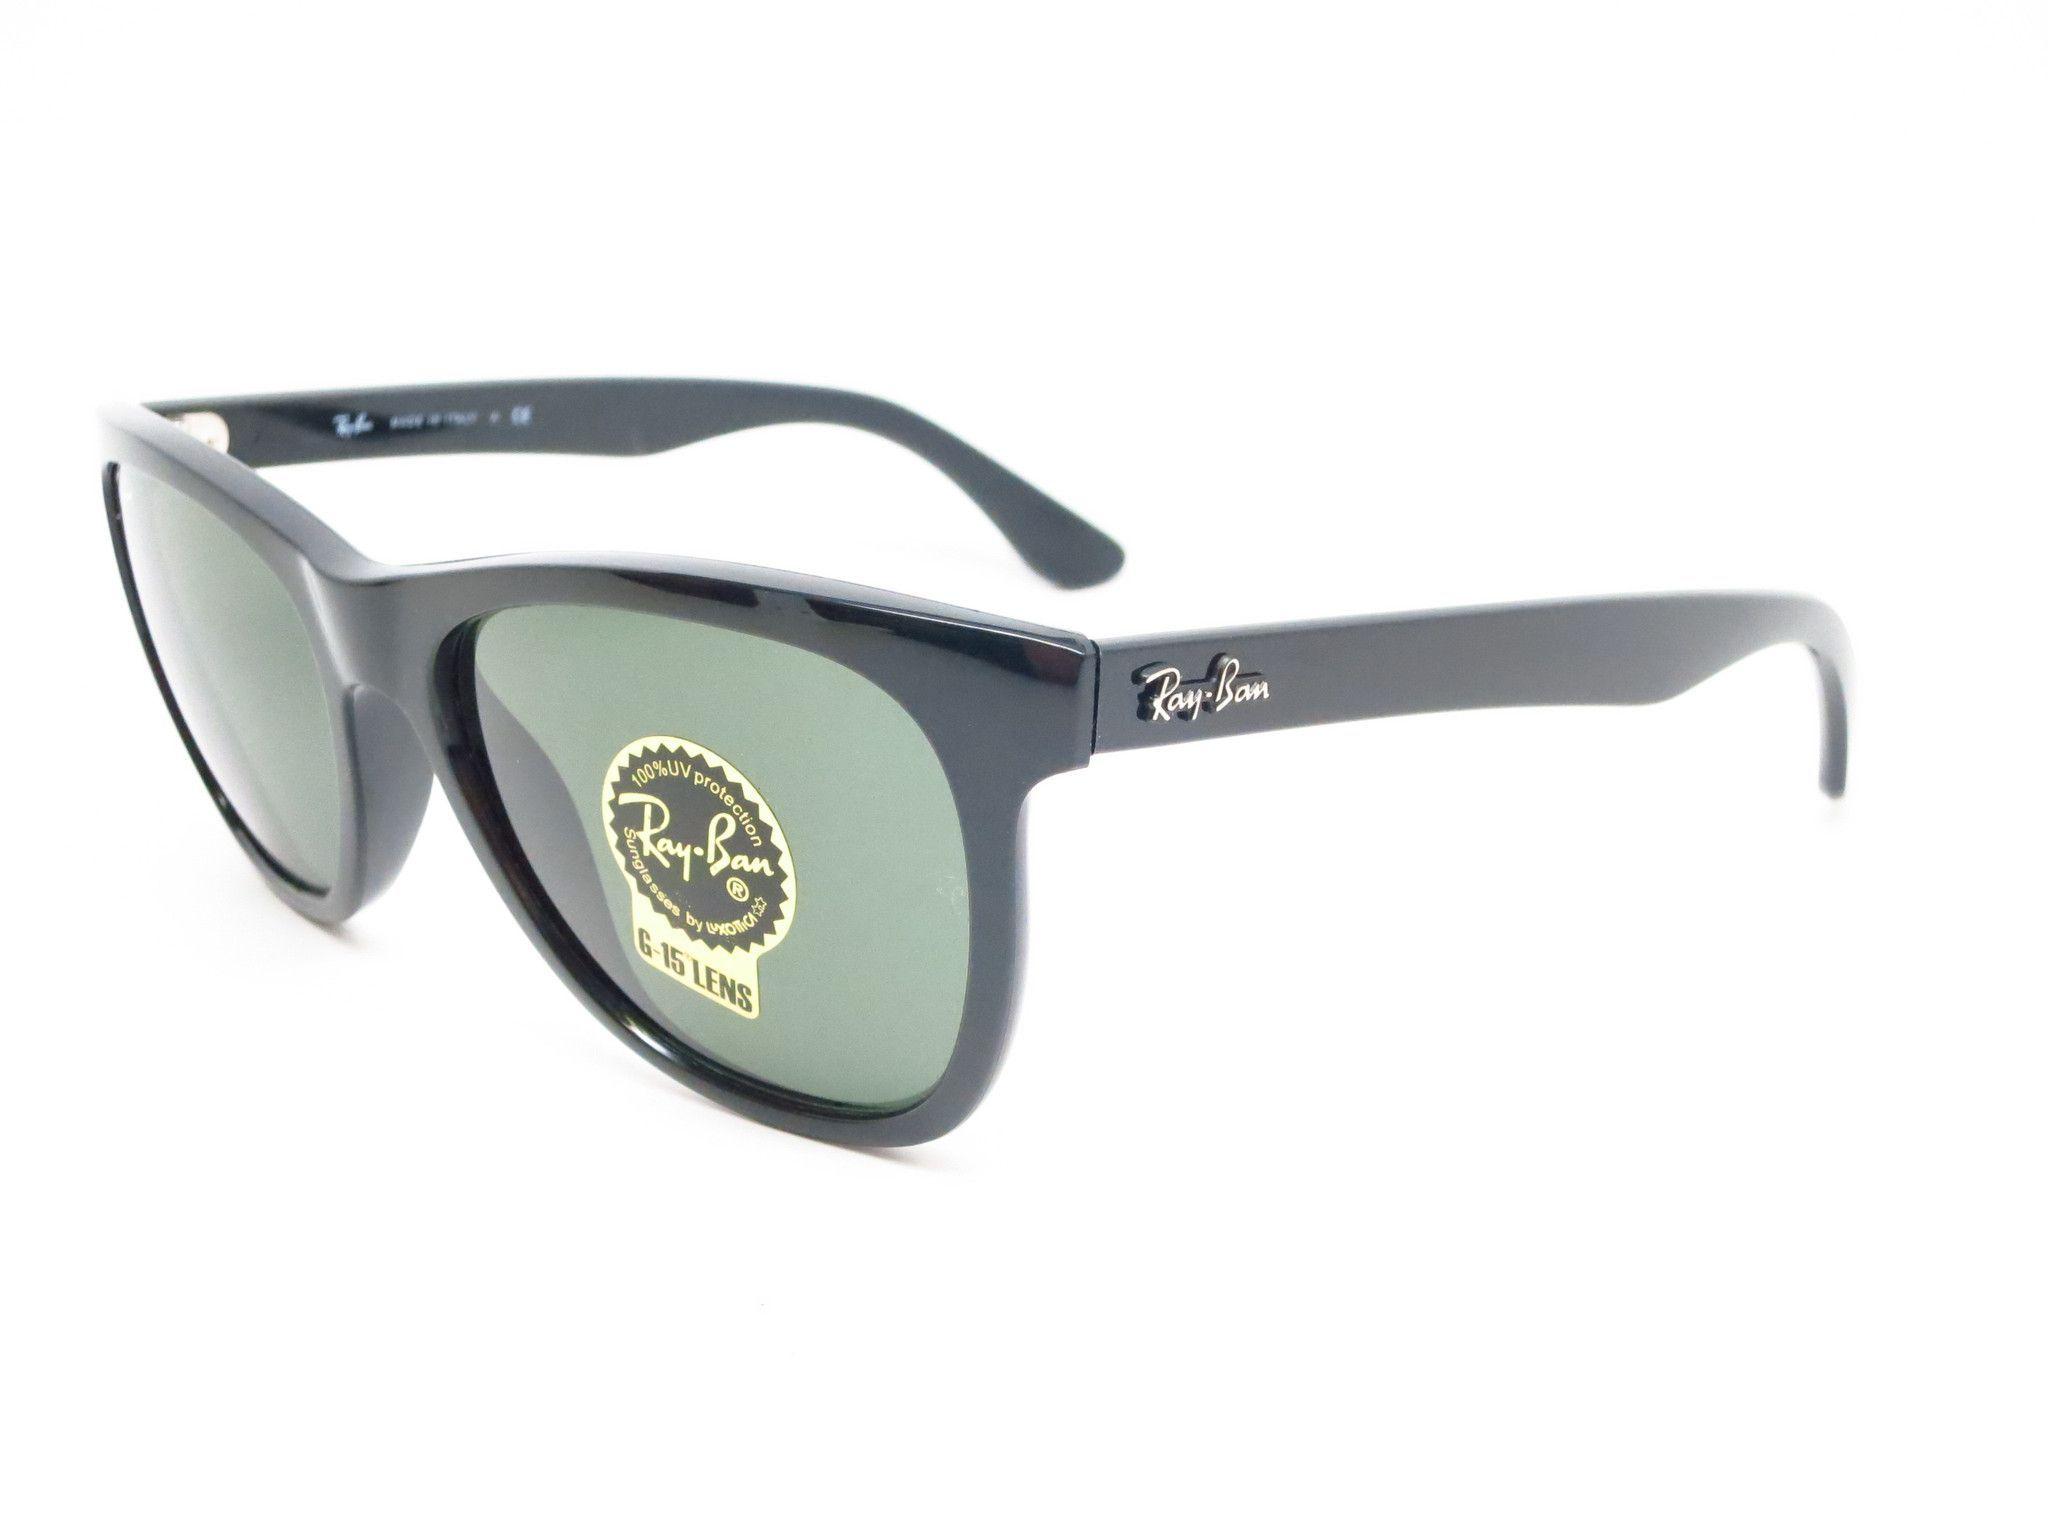 798efb5b74 Ray-Ban RB 4184 Highstreet 601 Black Sunglasses